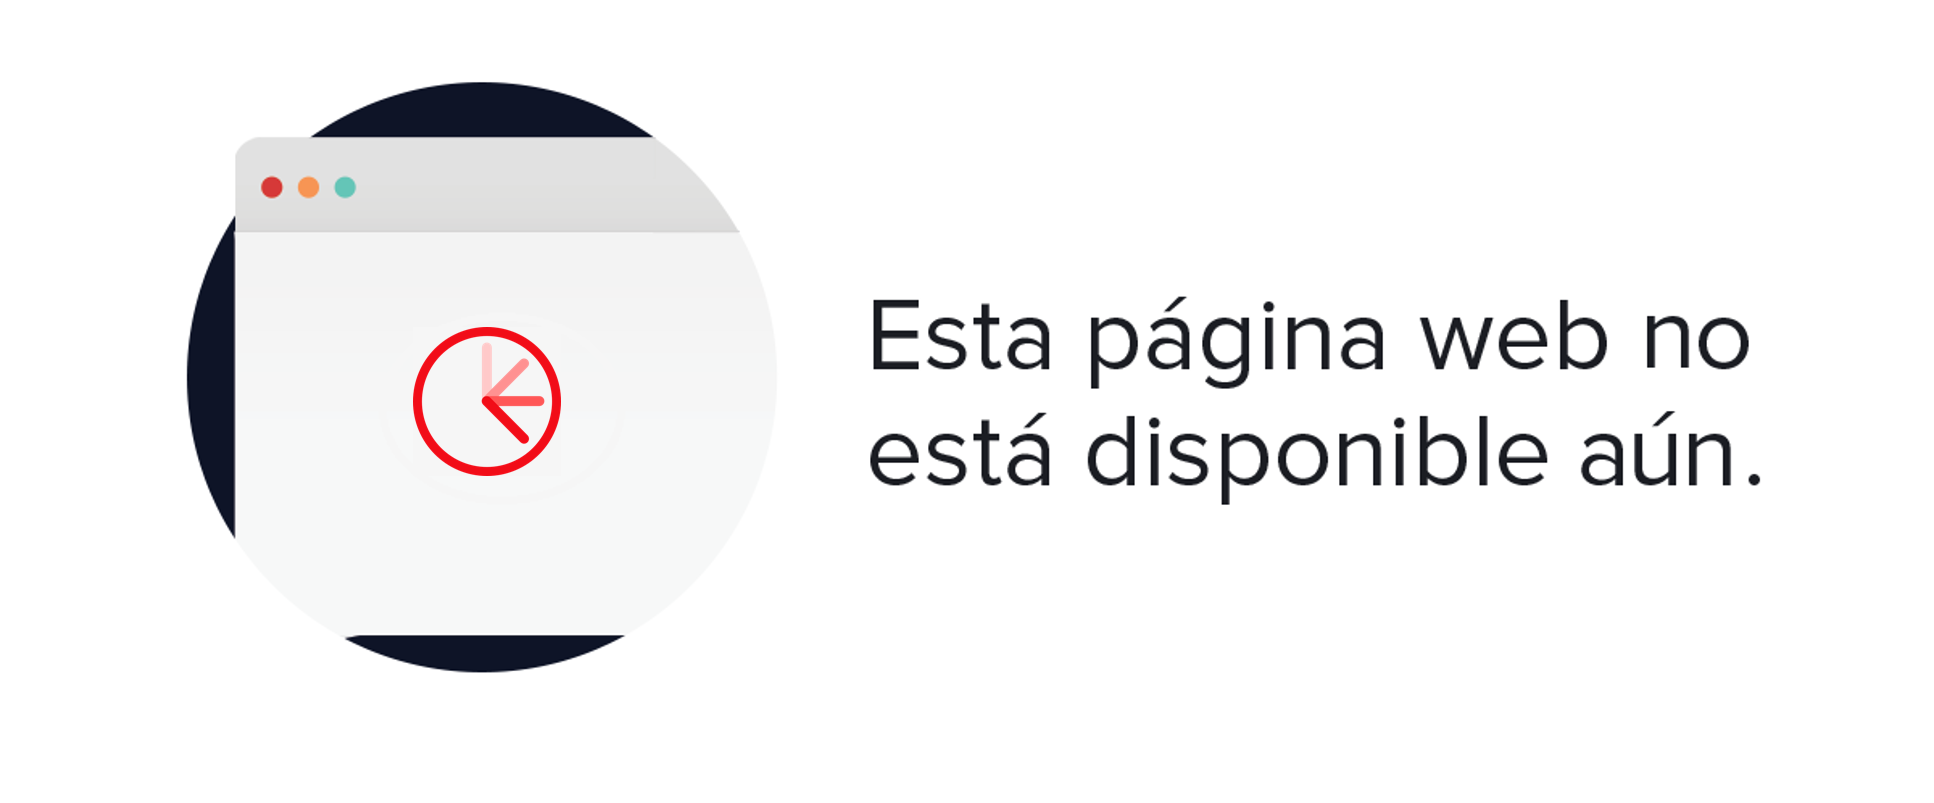 Polo Ralph Lauren - Chaqueta de pana de mujer Polo Ralph Lauren en marrón claro Marrón claro 001014966294127002 - CDCMVVV